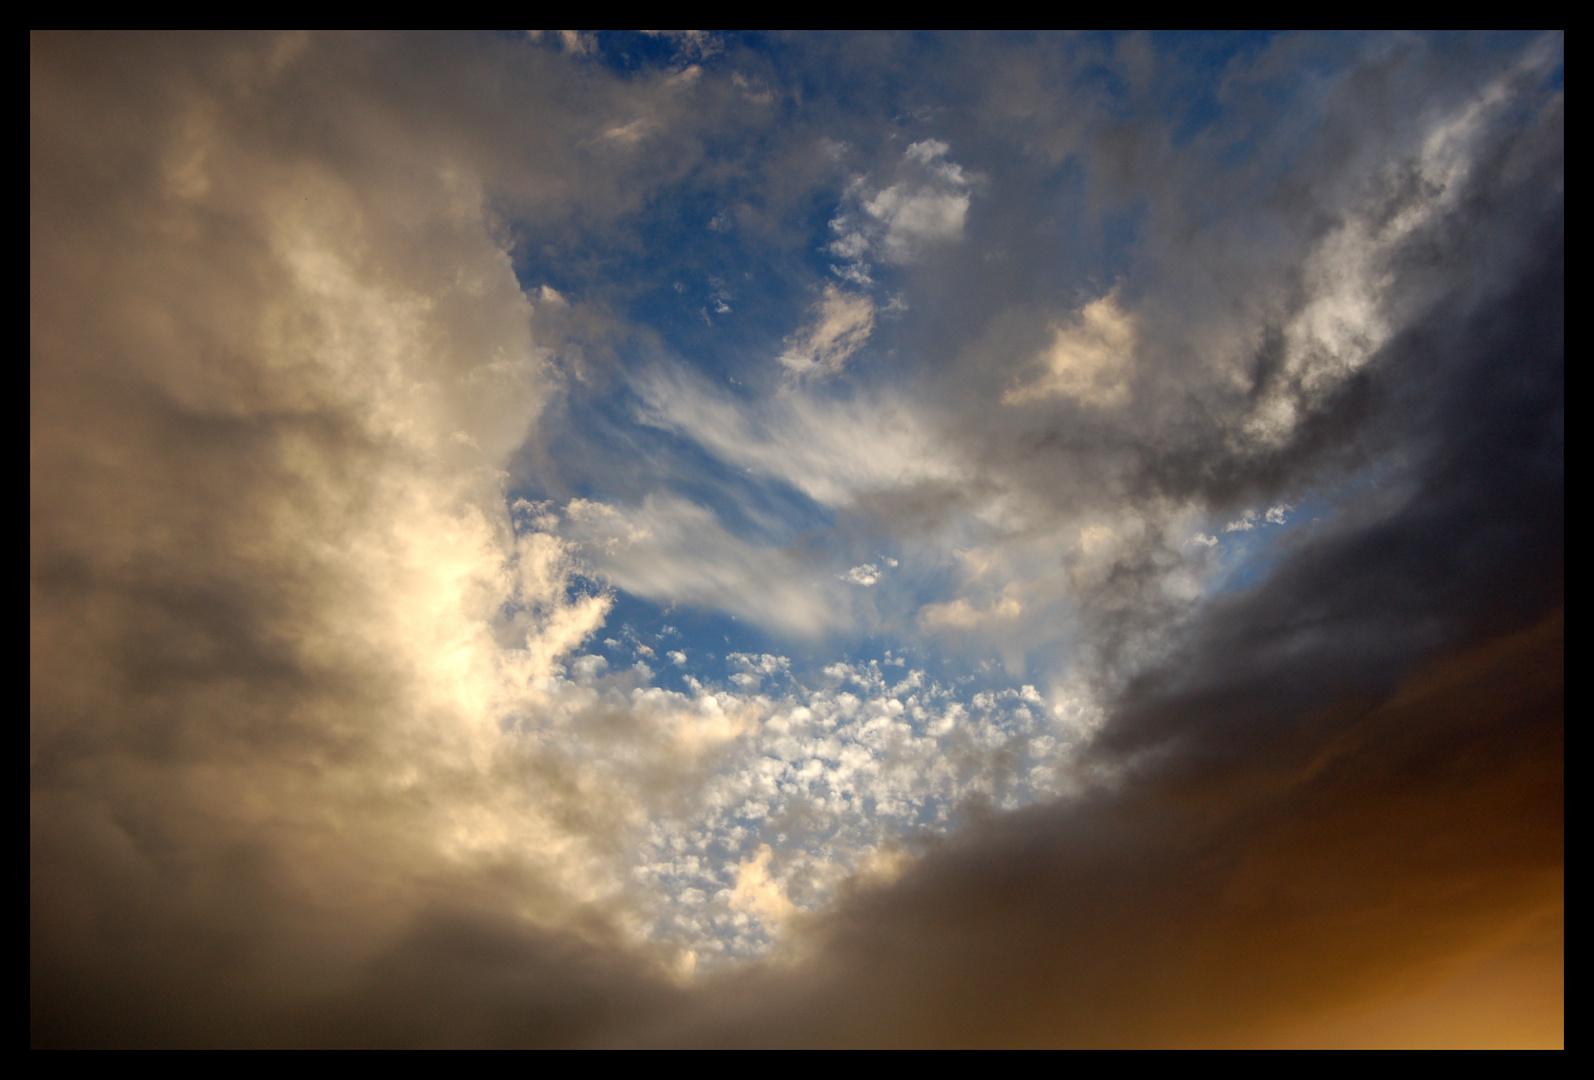 un coin de ciel bleu